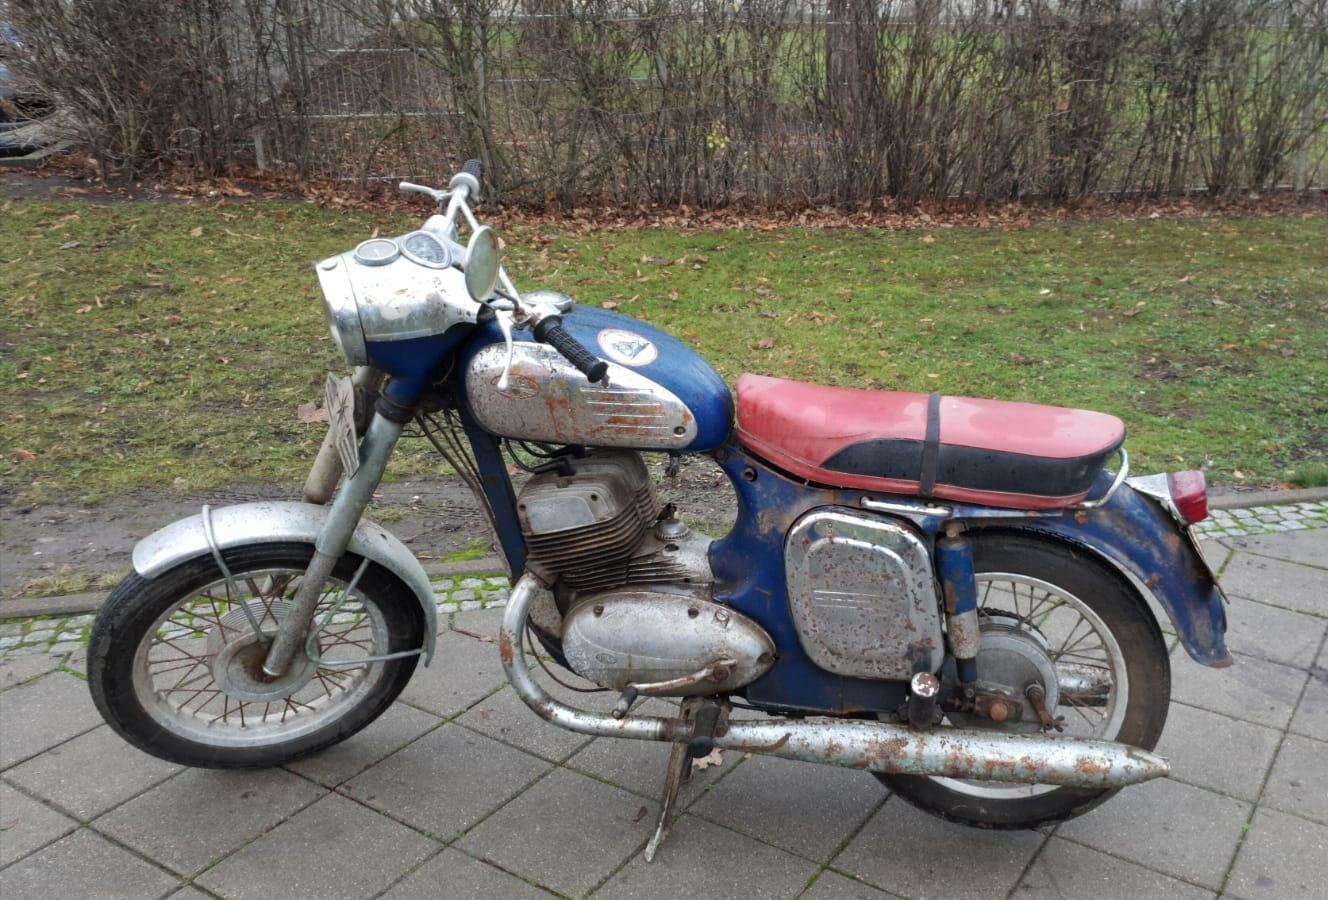 Oldtimer-Motorrad gefunden